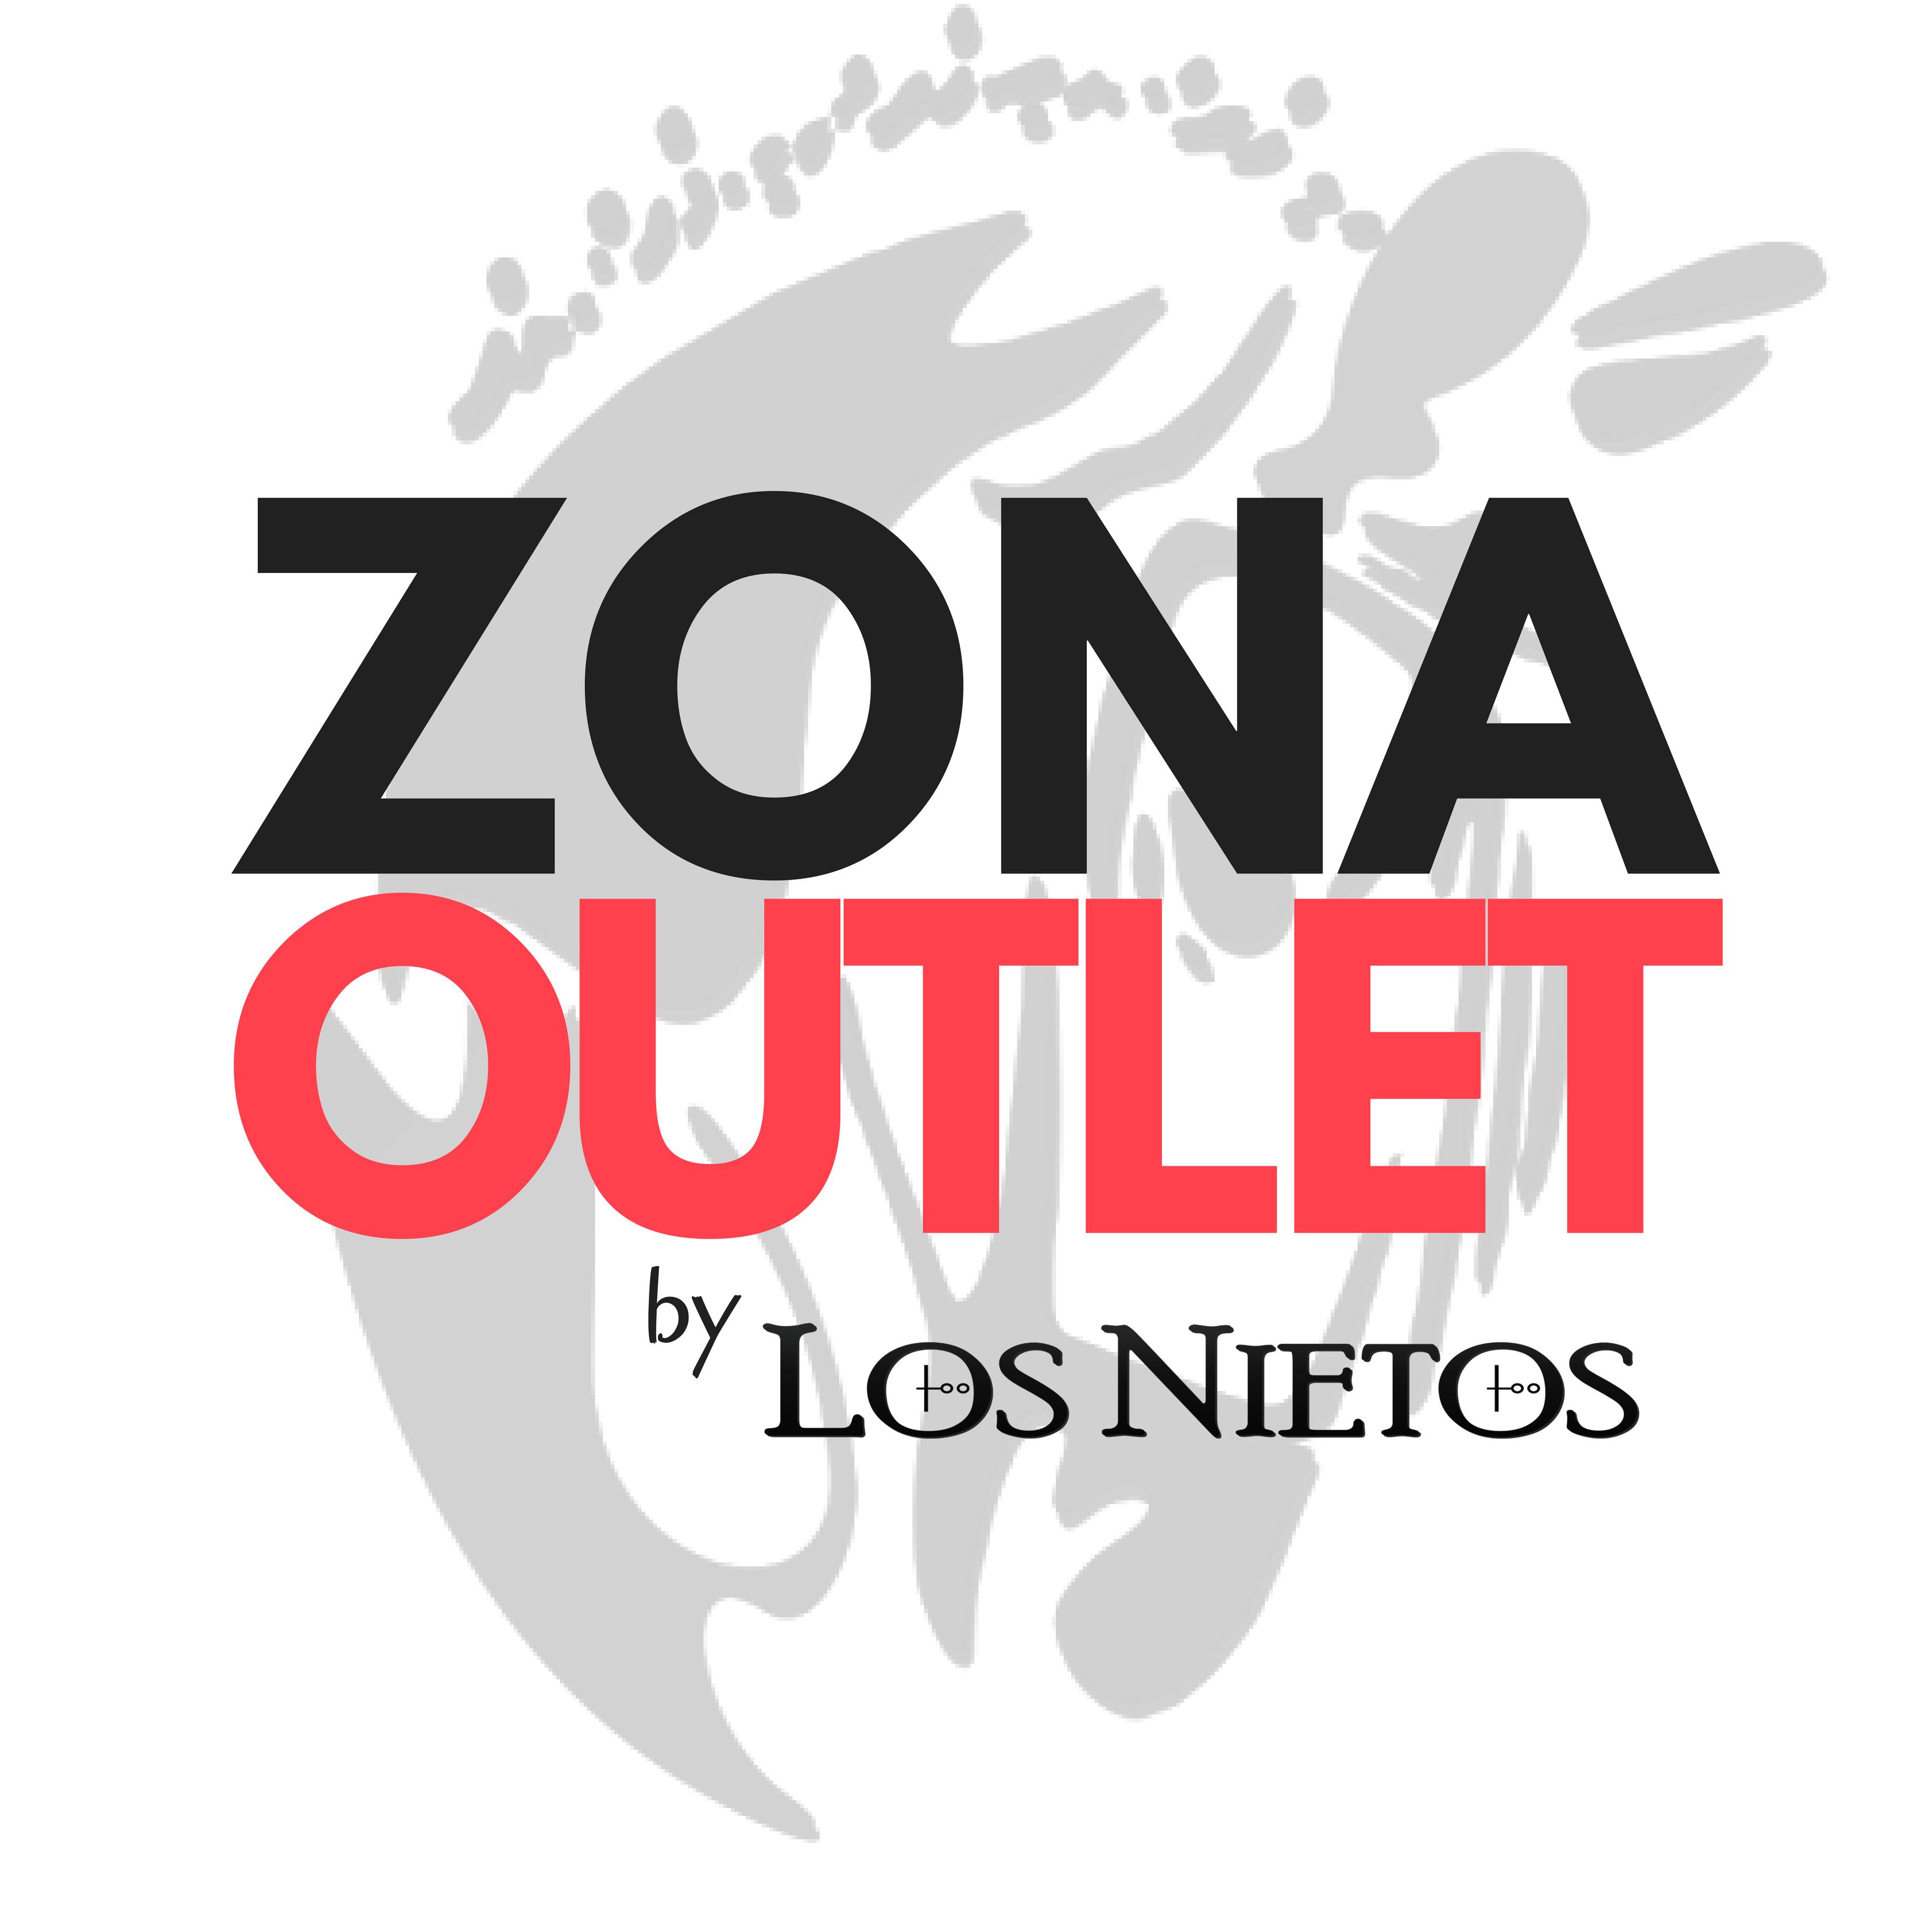 zonaoutlet_1.png